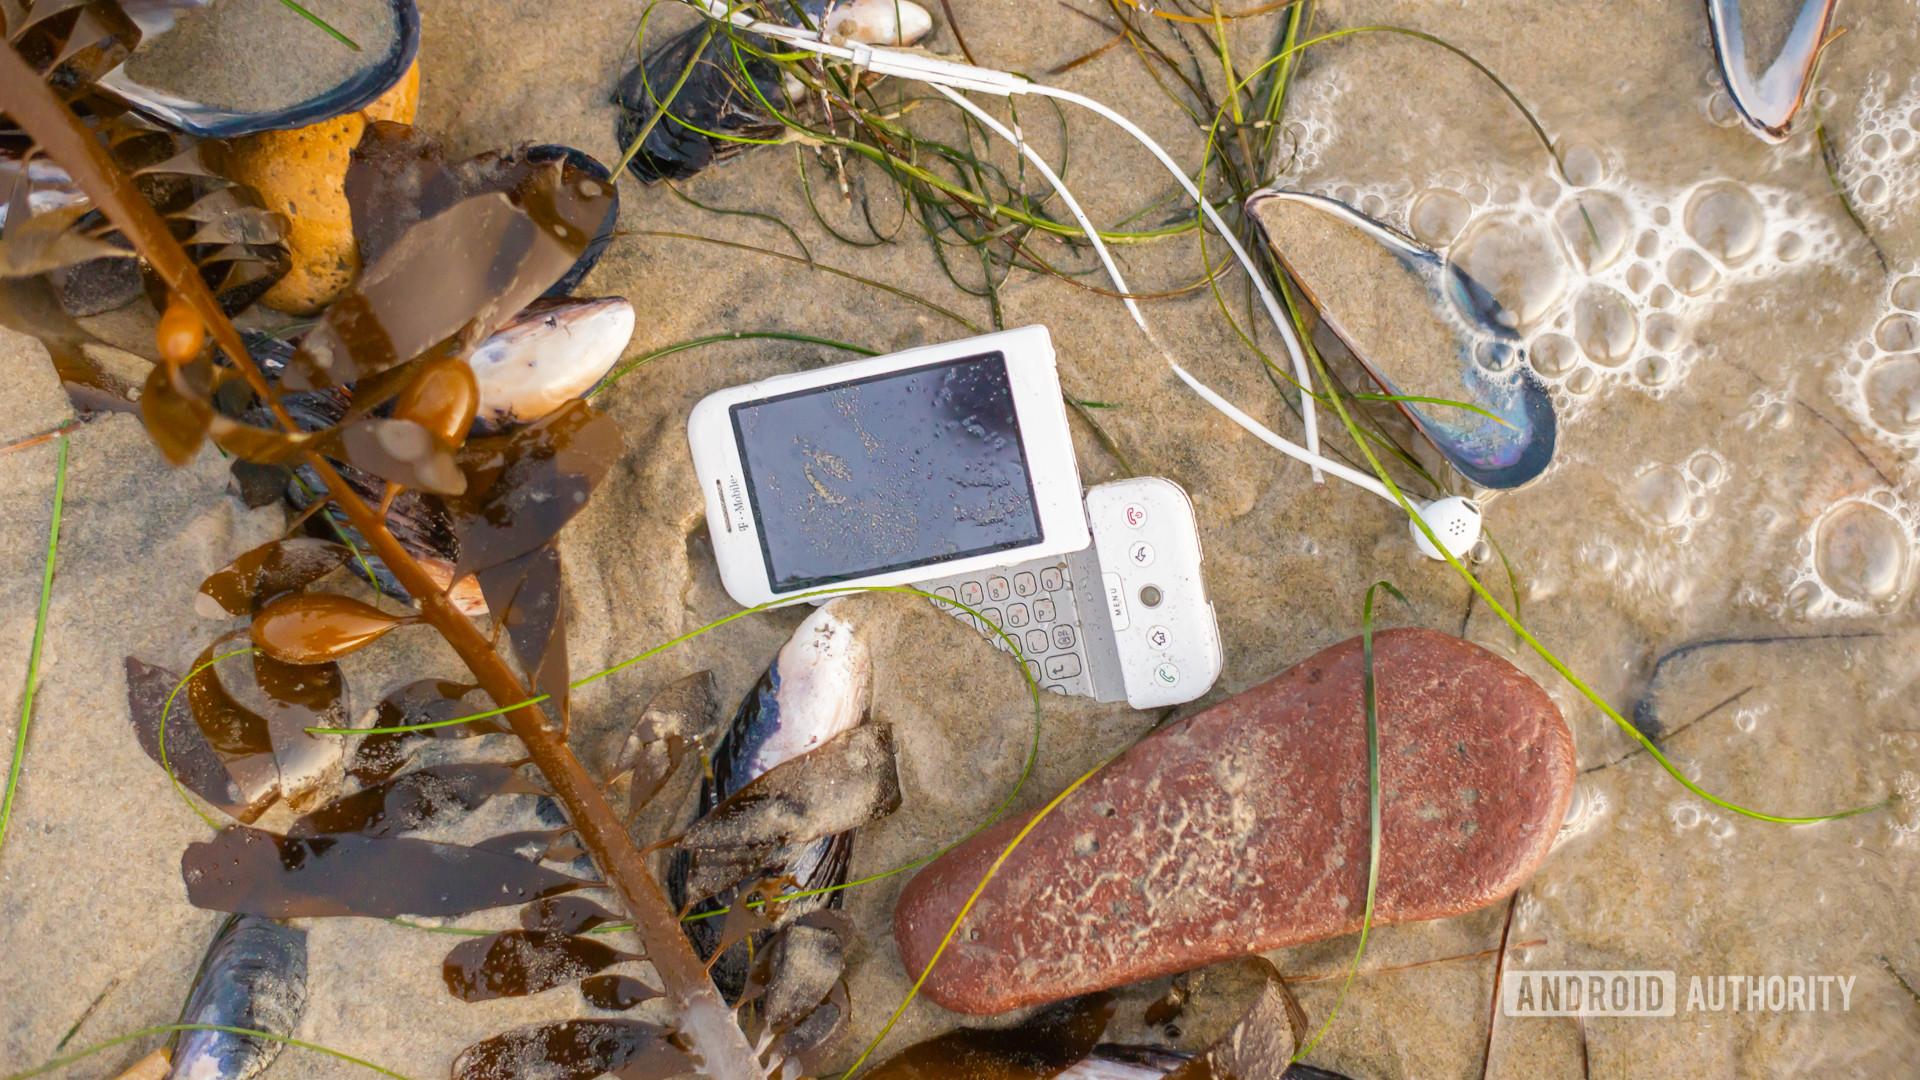 E Waste smartphone on beach1